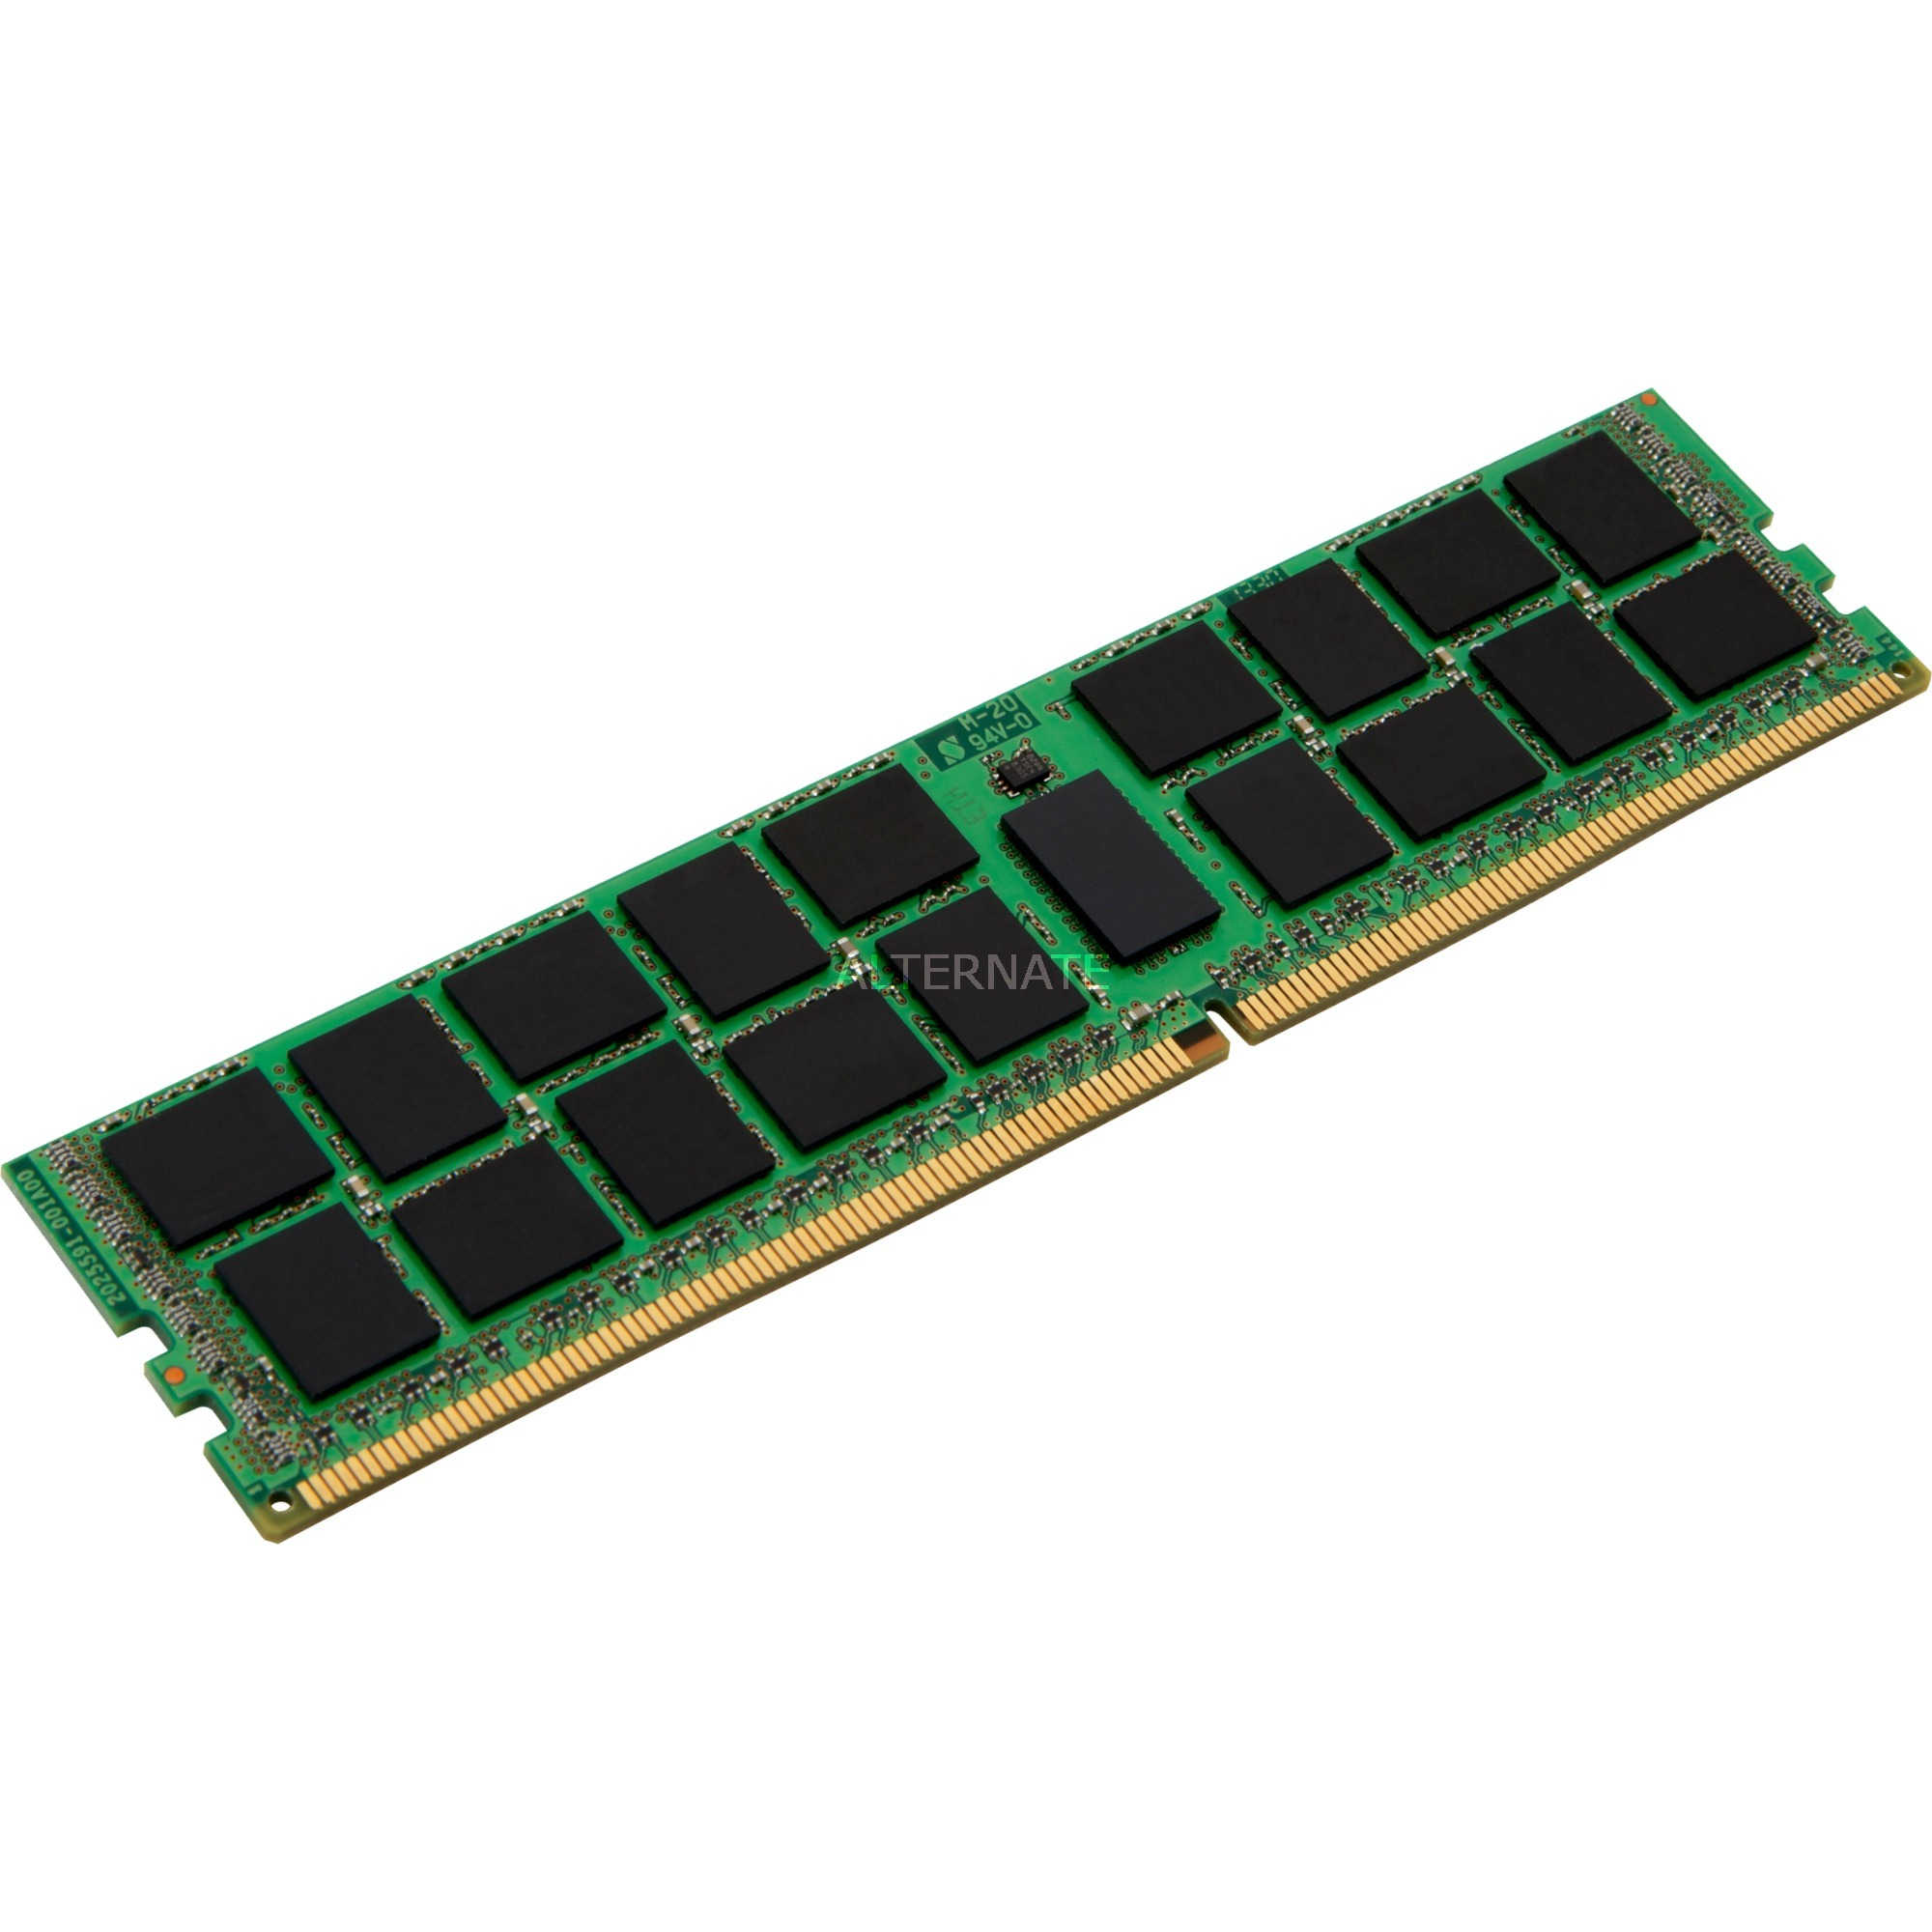 System Specific Memory 16GB DDR4 2400MHz 16GB DDR4 2400MHz ECC módulo de memoria, Memoria RAM